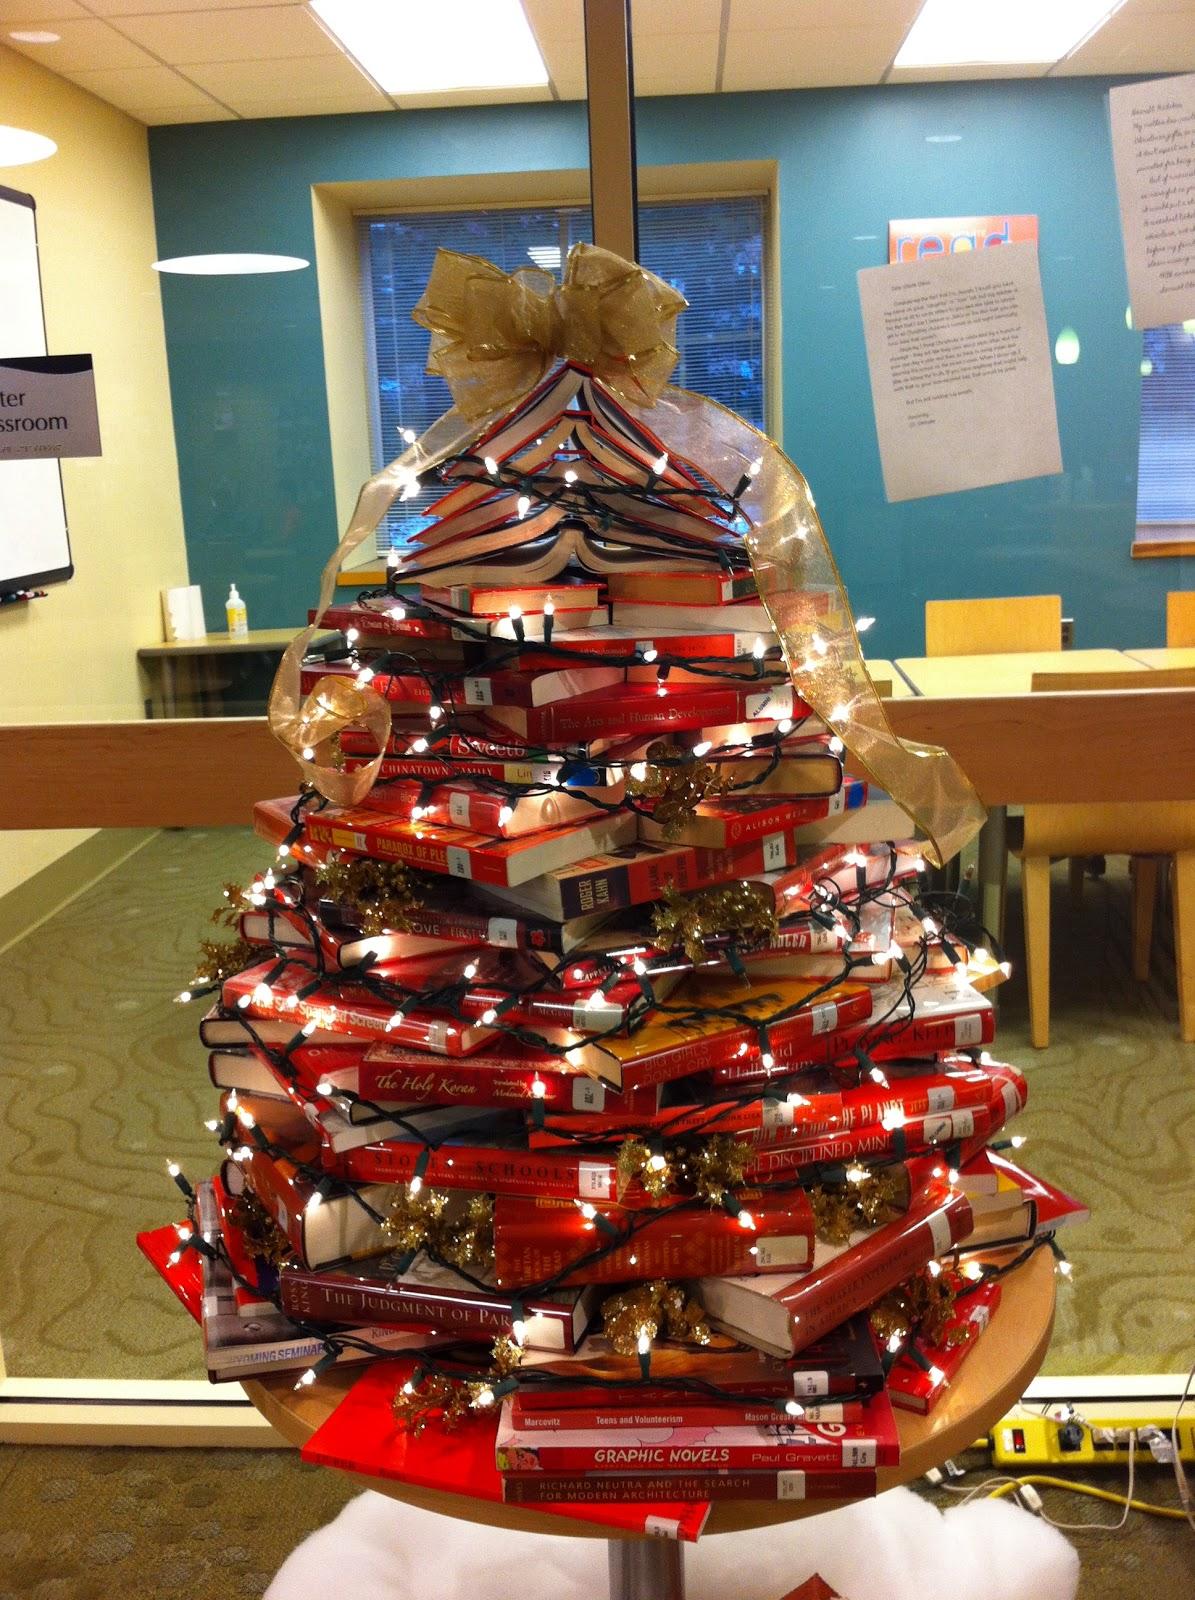 Celebrating The Holidays Library Style